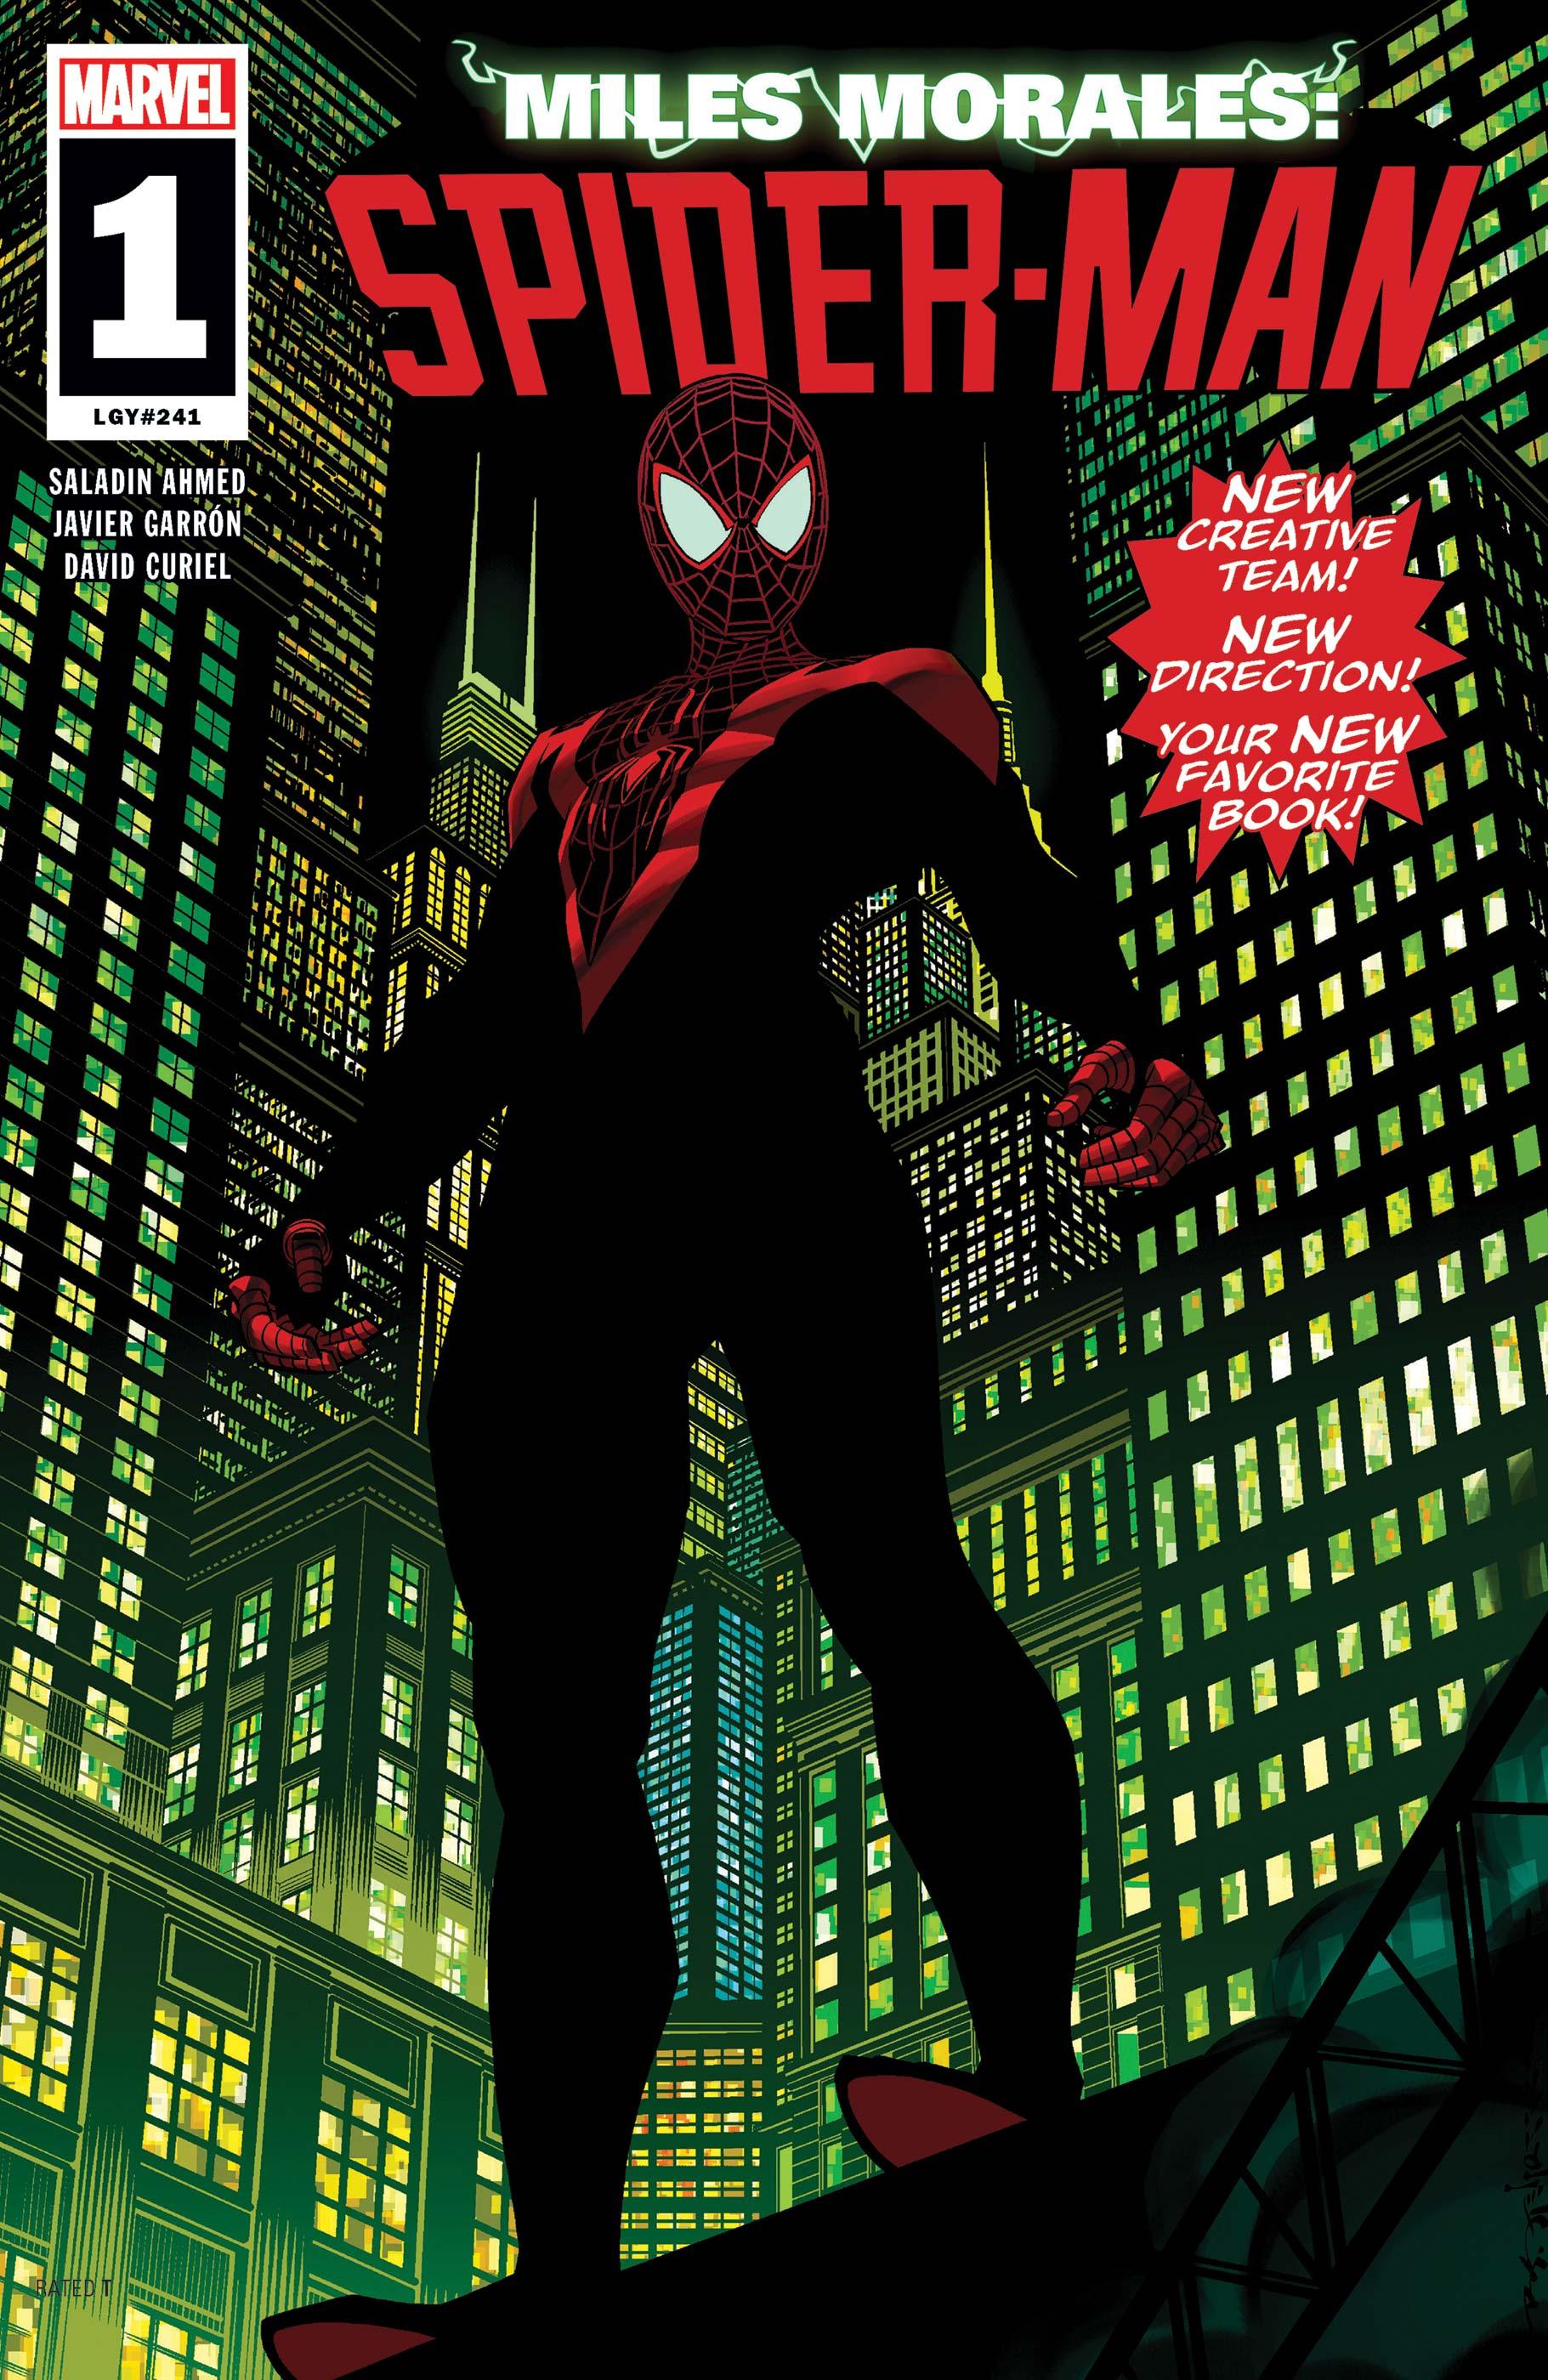 Miles Morales: Spider-Man (2018) #1